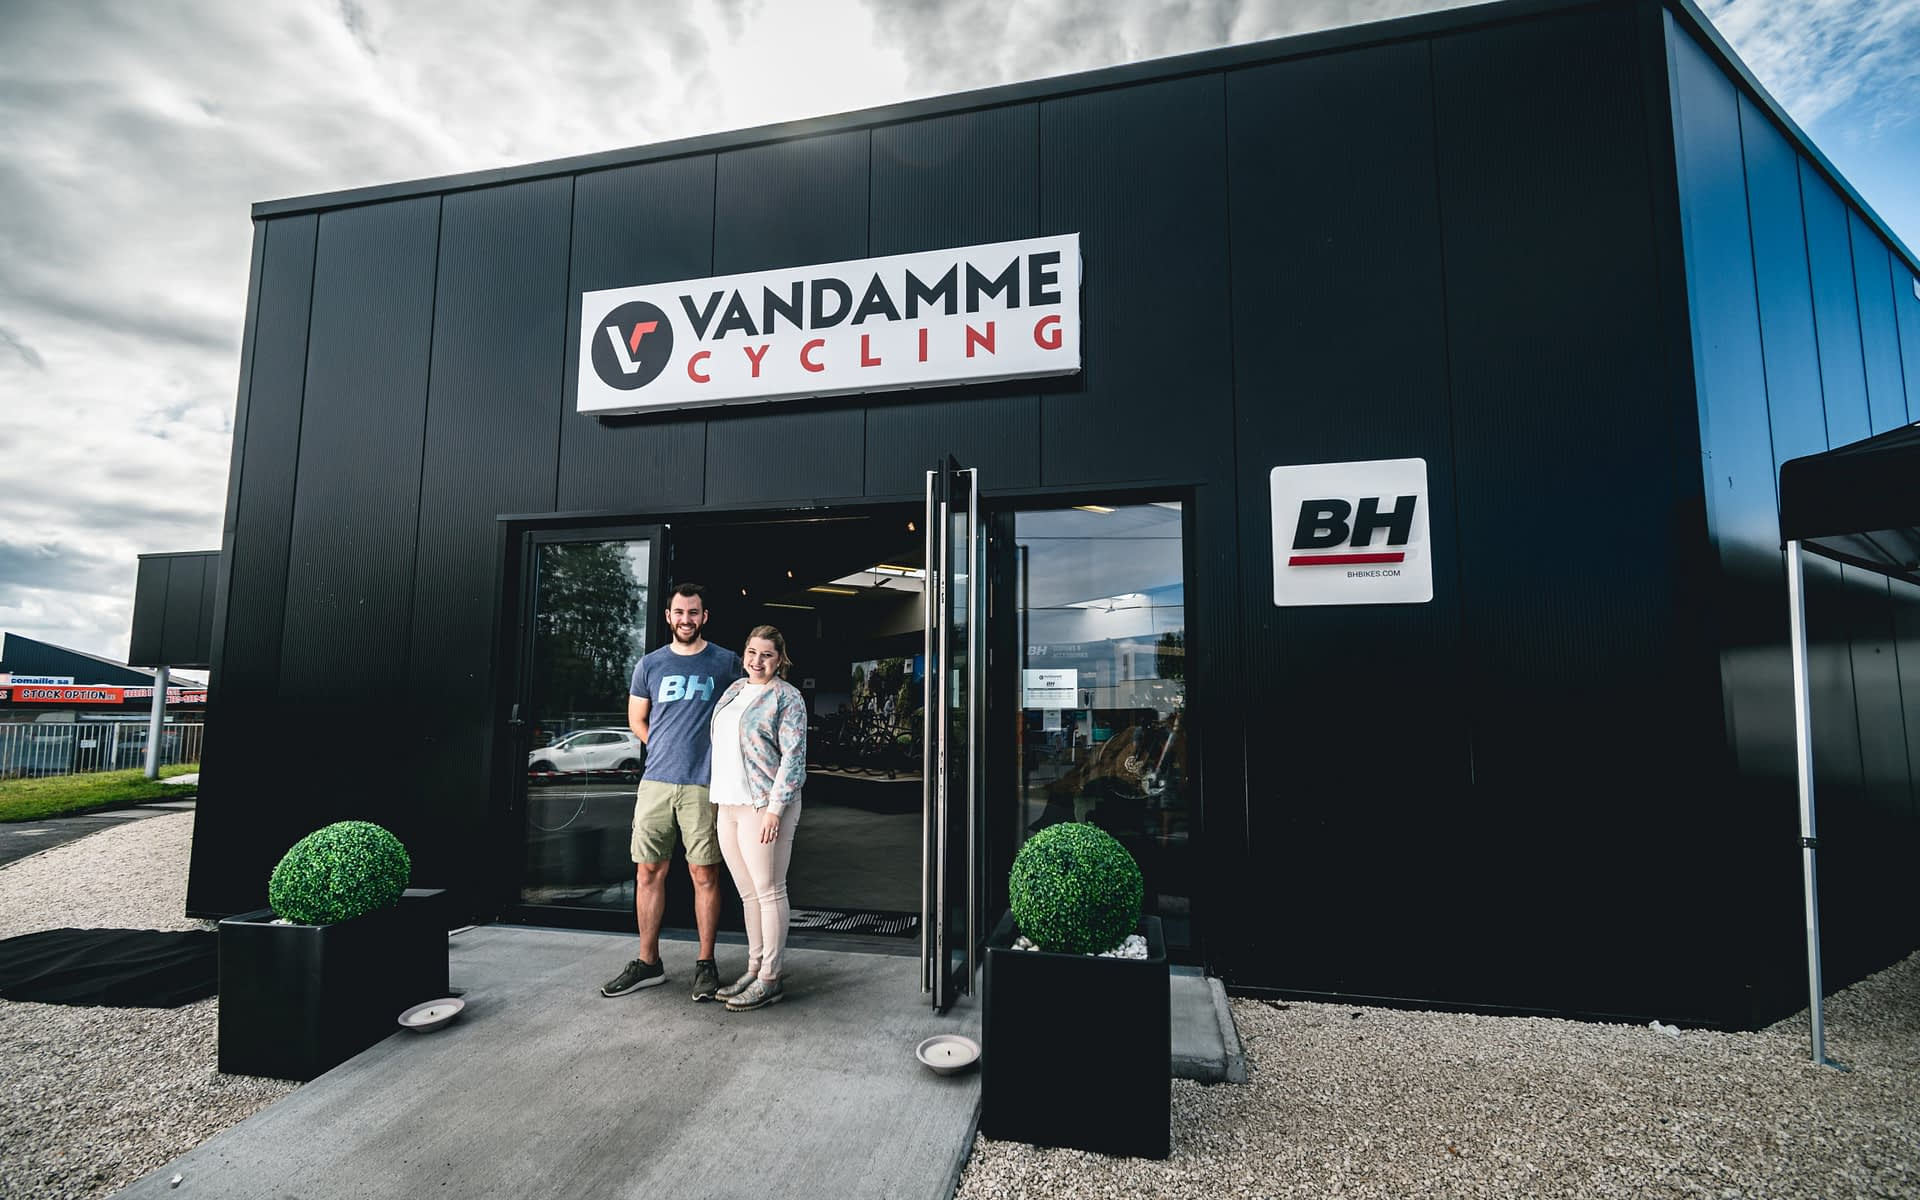 Vandamme-Cycling-BH-Vojo-HD-Copyright-OBeart-Vojomag-29